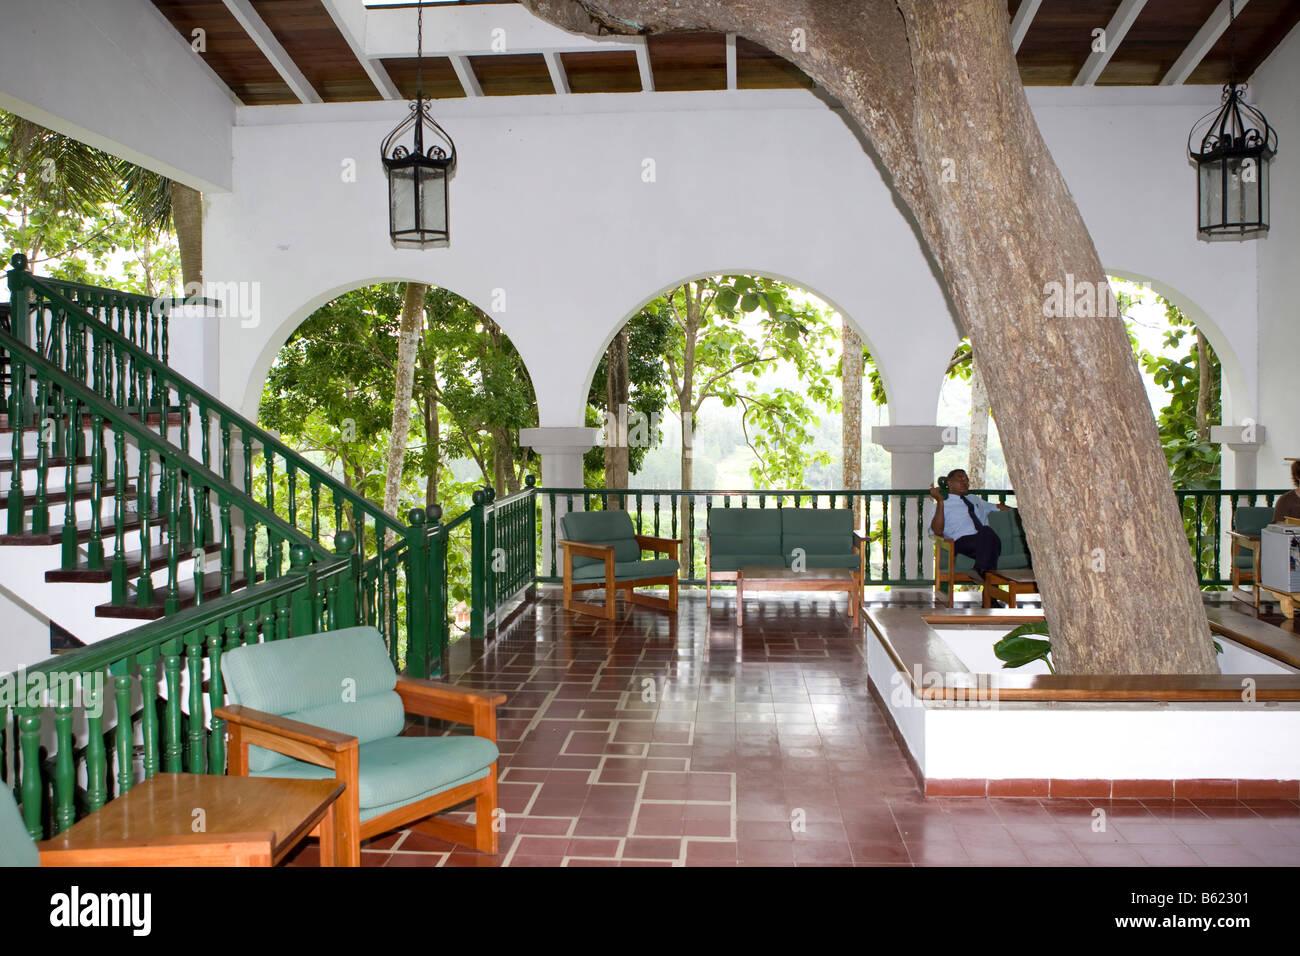 Moka Hotel, Interior, Banjos del San Juan, Cuba, Caribbean - Stock Image